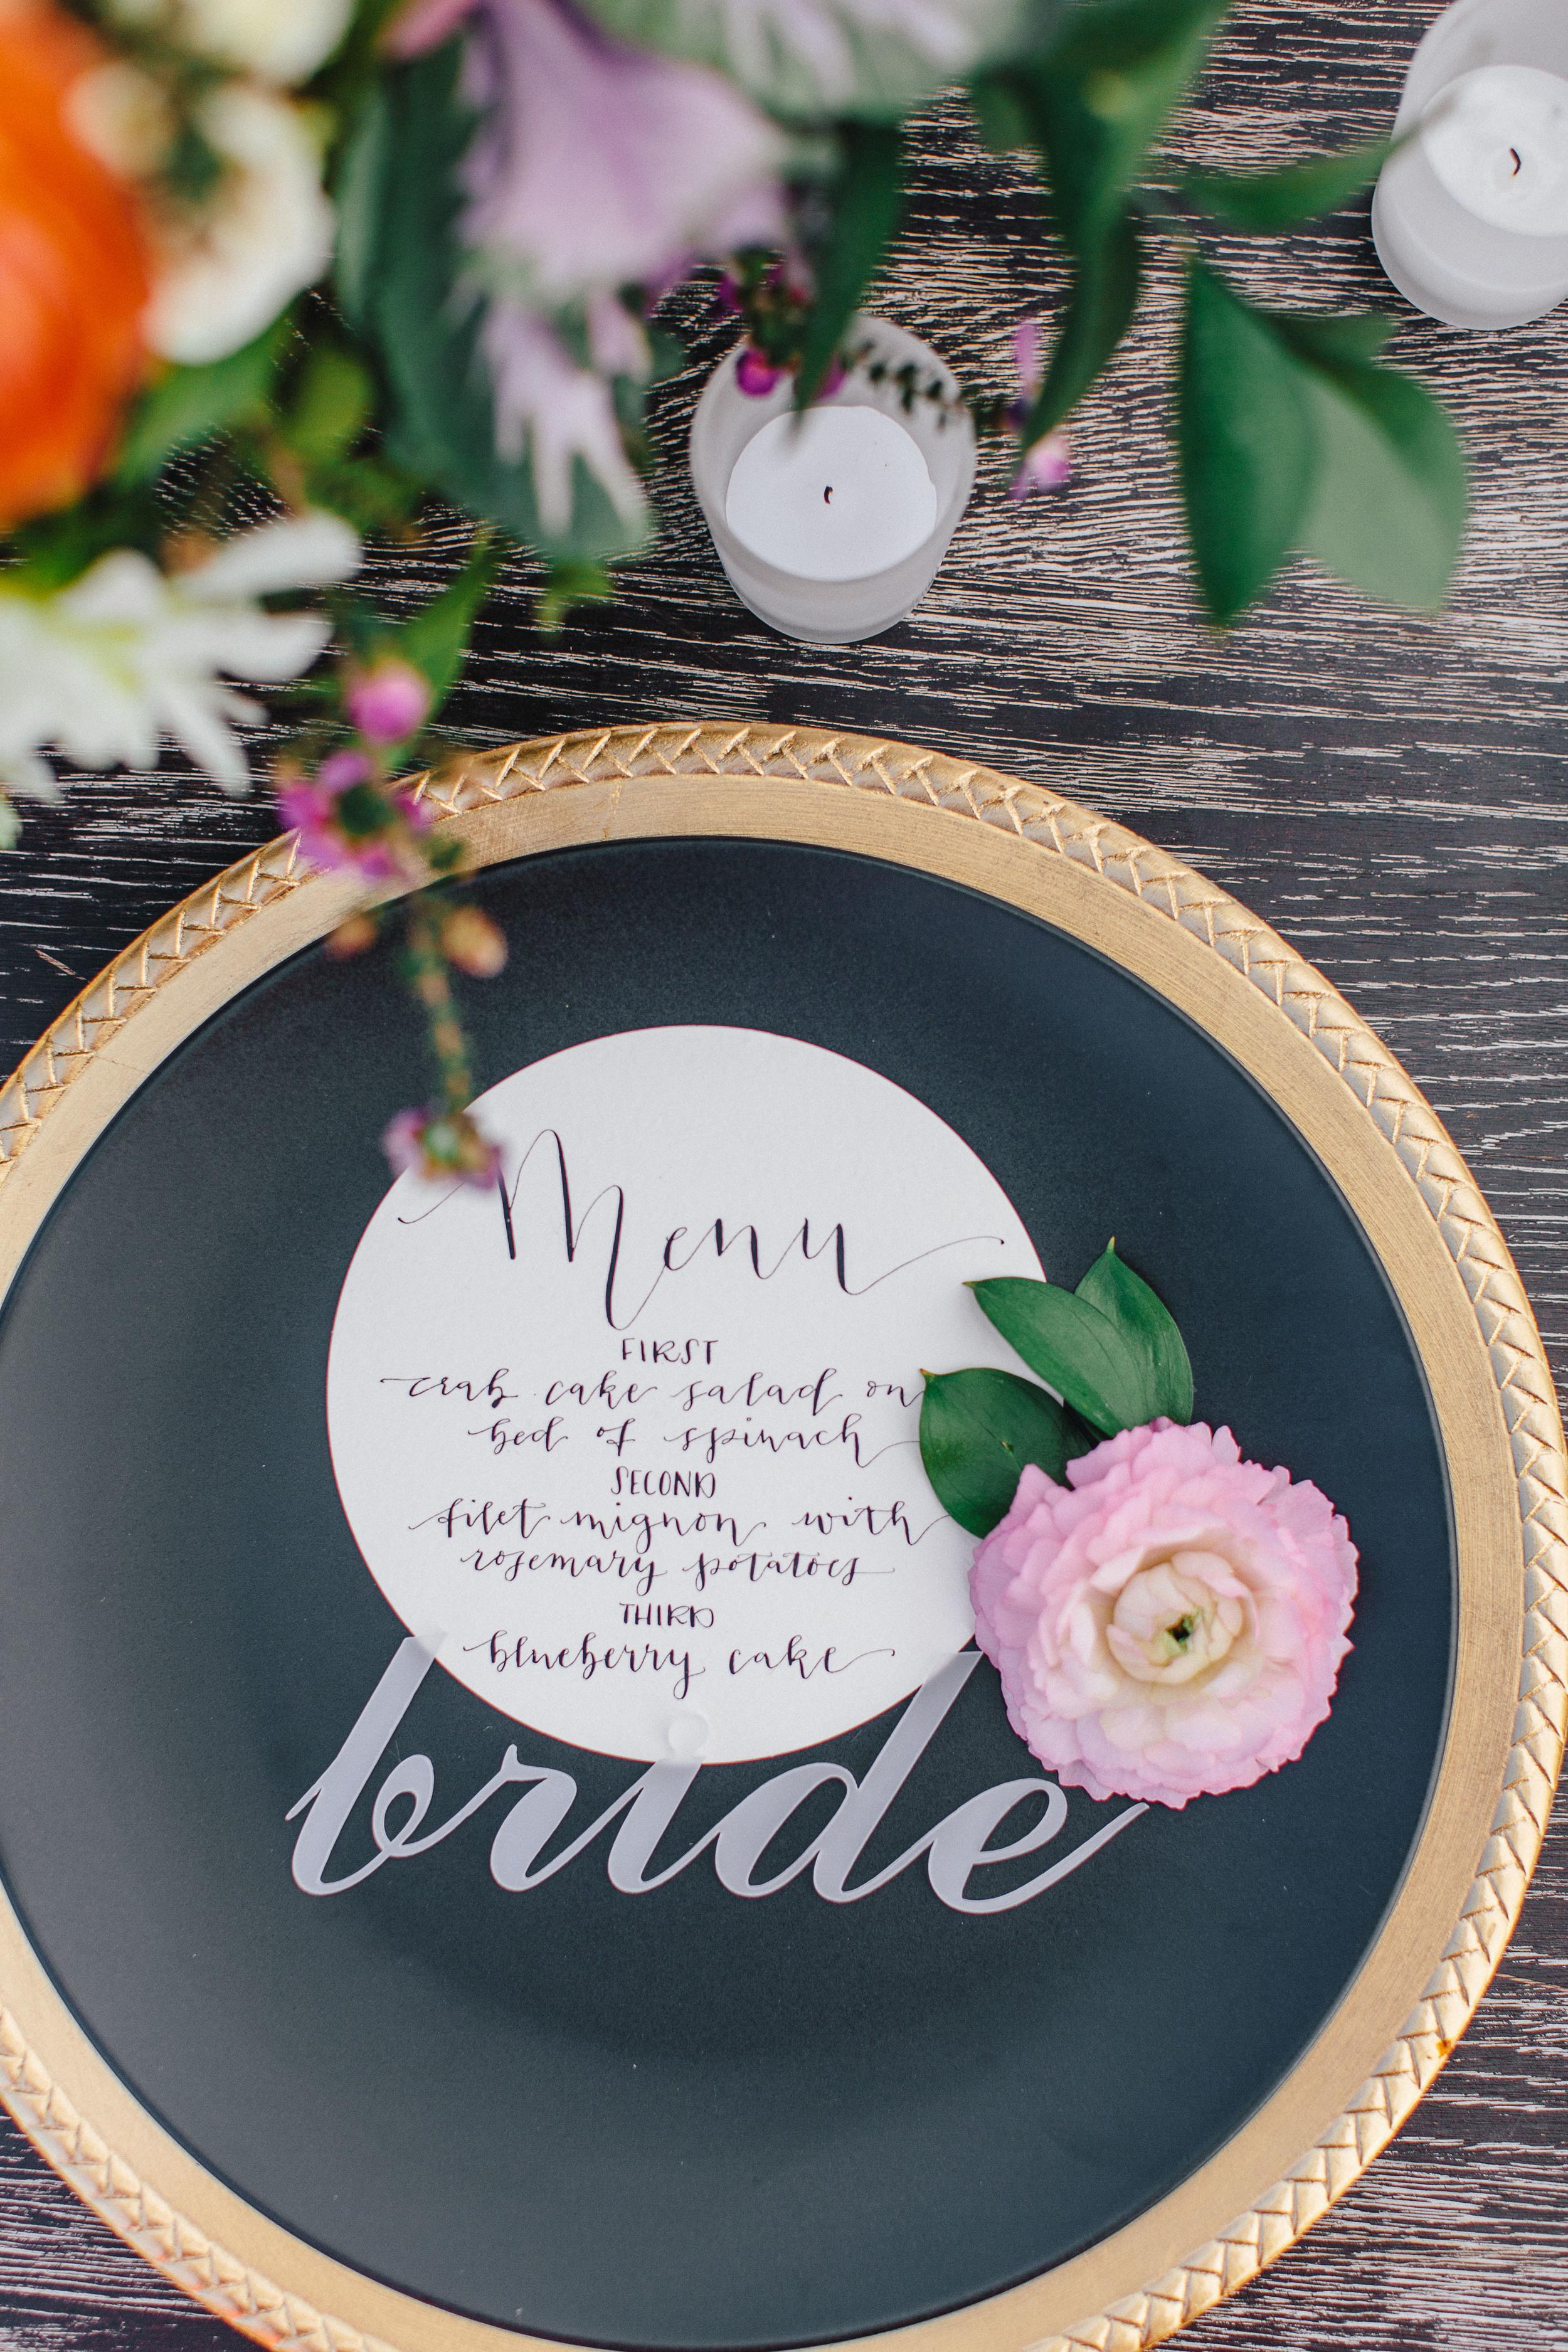 Maxit Flower Design; Vineyard Bridal Styled Shoot 0161_Kristen Curette Photography.jpg